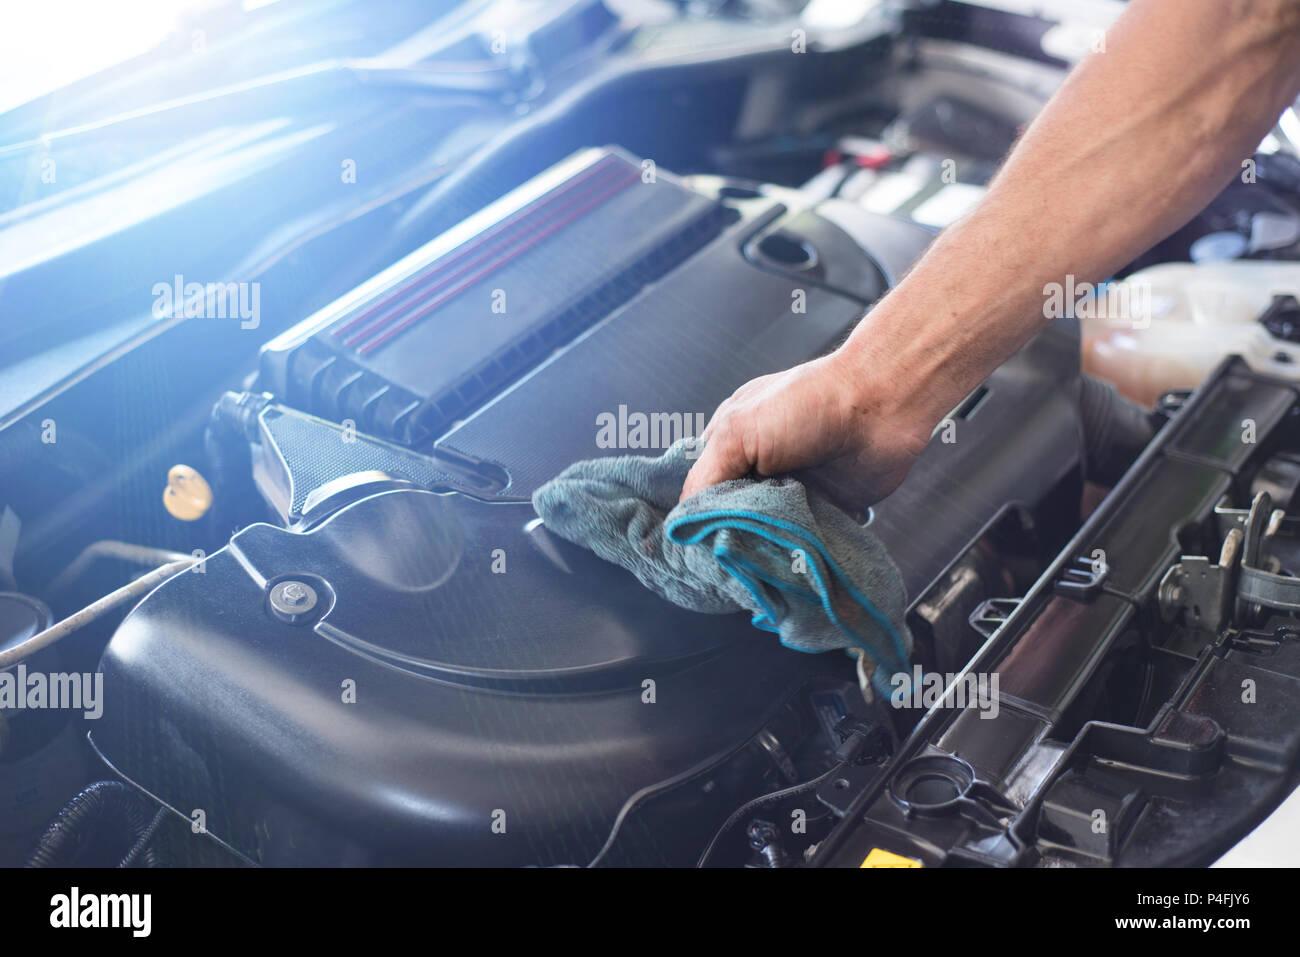 Mechanic cleaning car engine - Stock Image